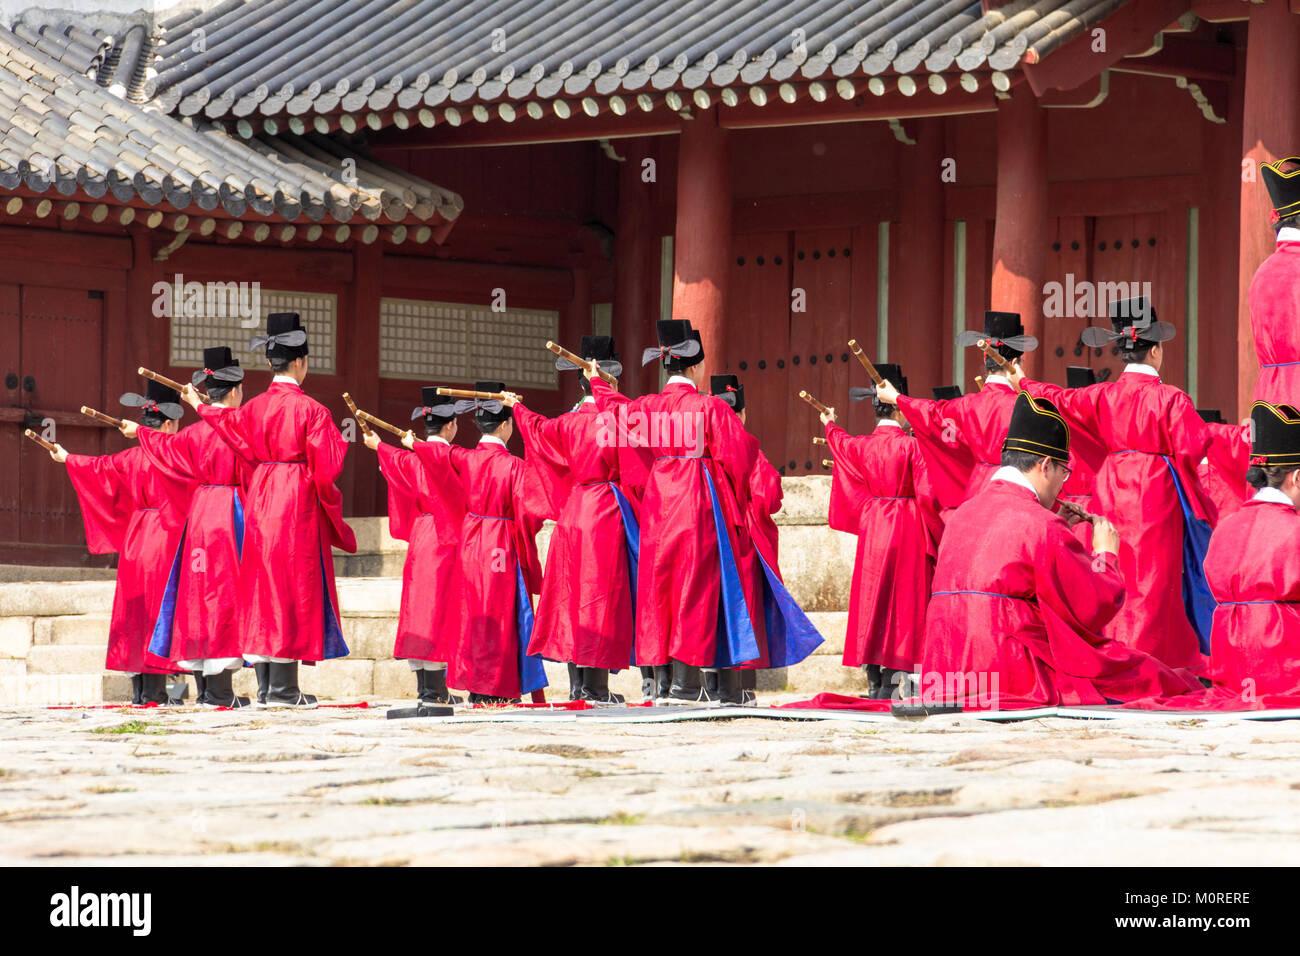 1 November 2014, Seoul, South Korea: Jerye ceremony held twice per year in Jongmyo Shrine to worship the Confucian - Stock Image